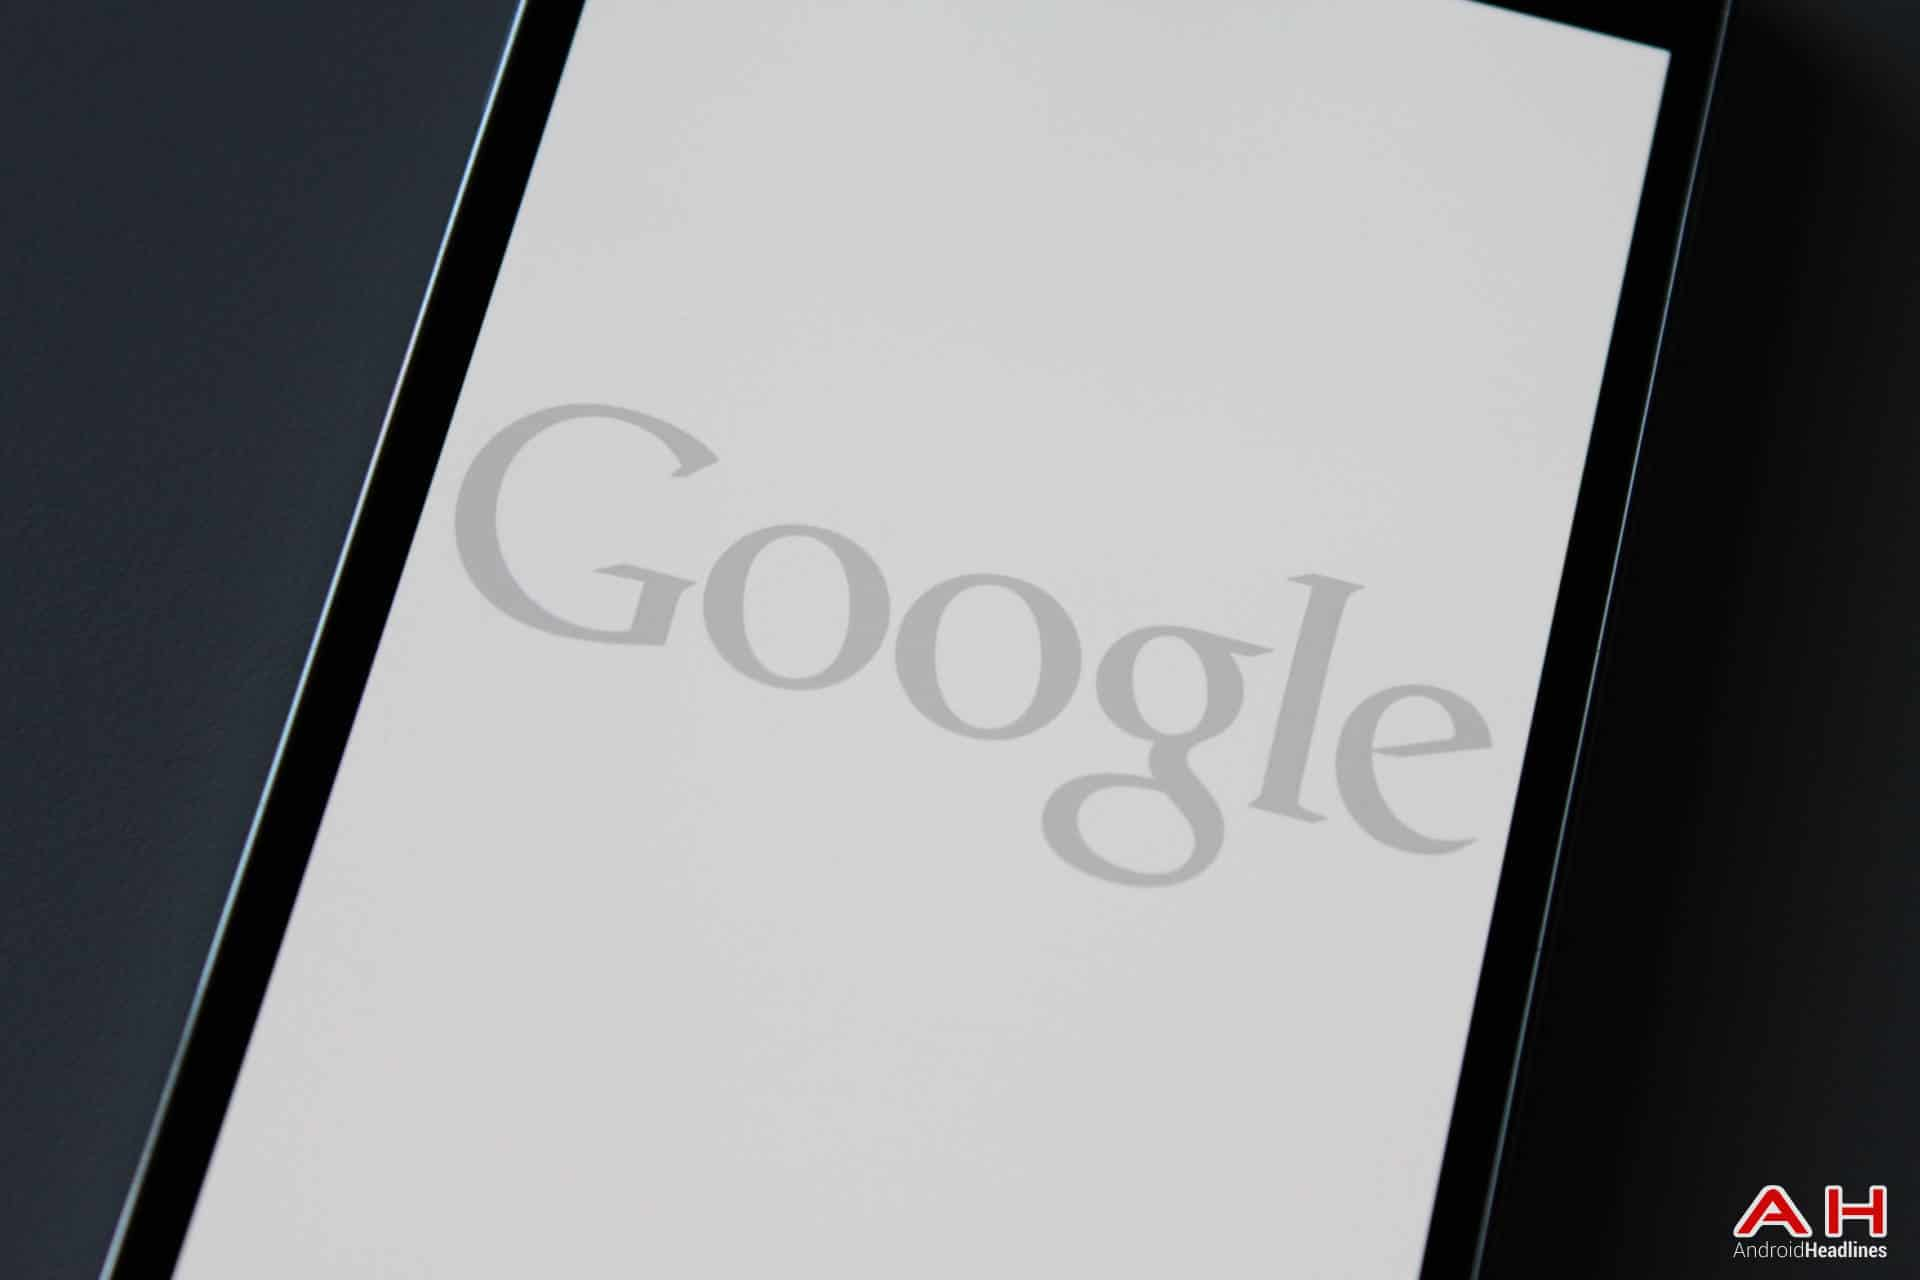 AH Google Logo White 1.4